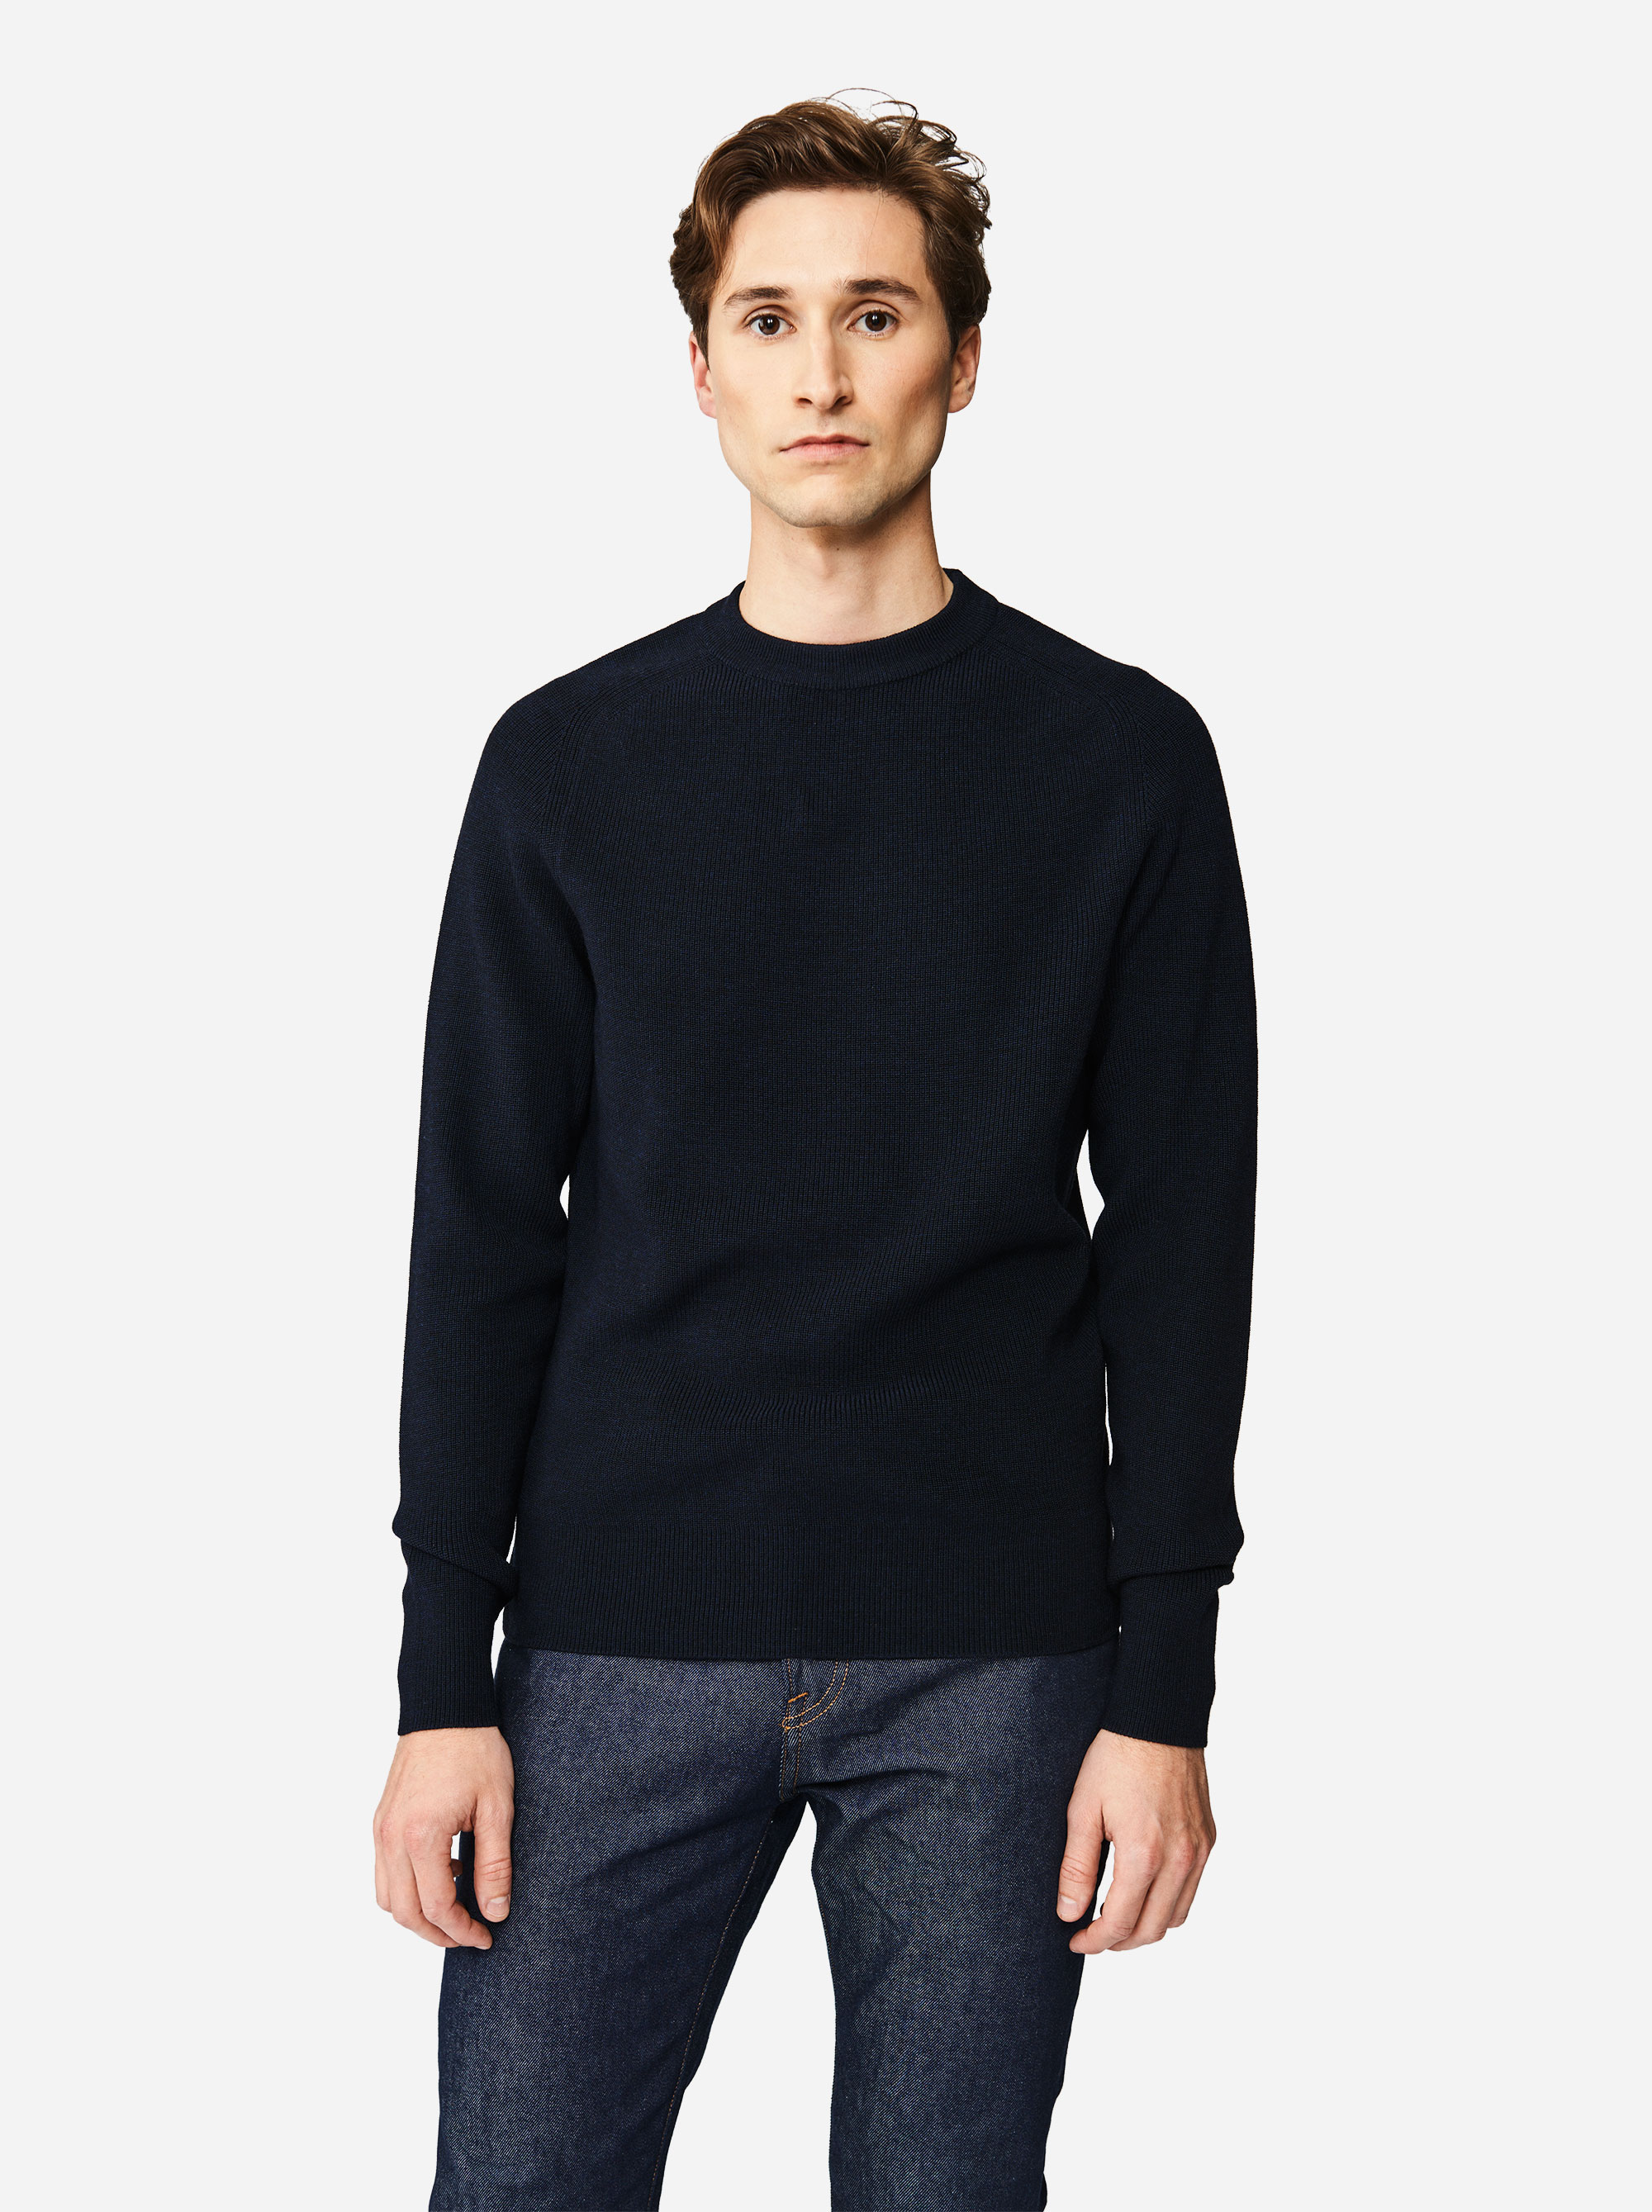 Teym - The Merino Sweater - Men - Blue - 1